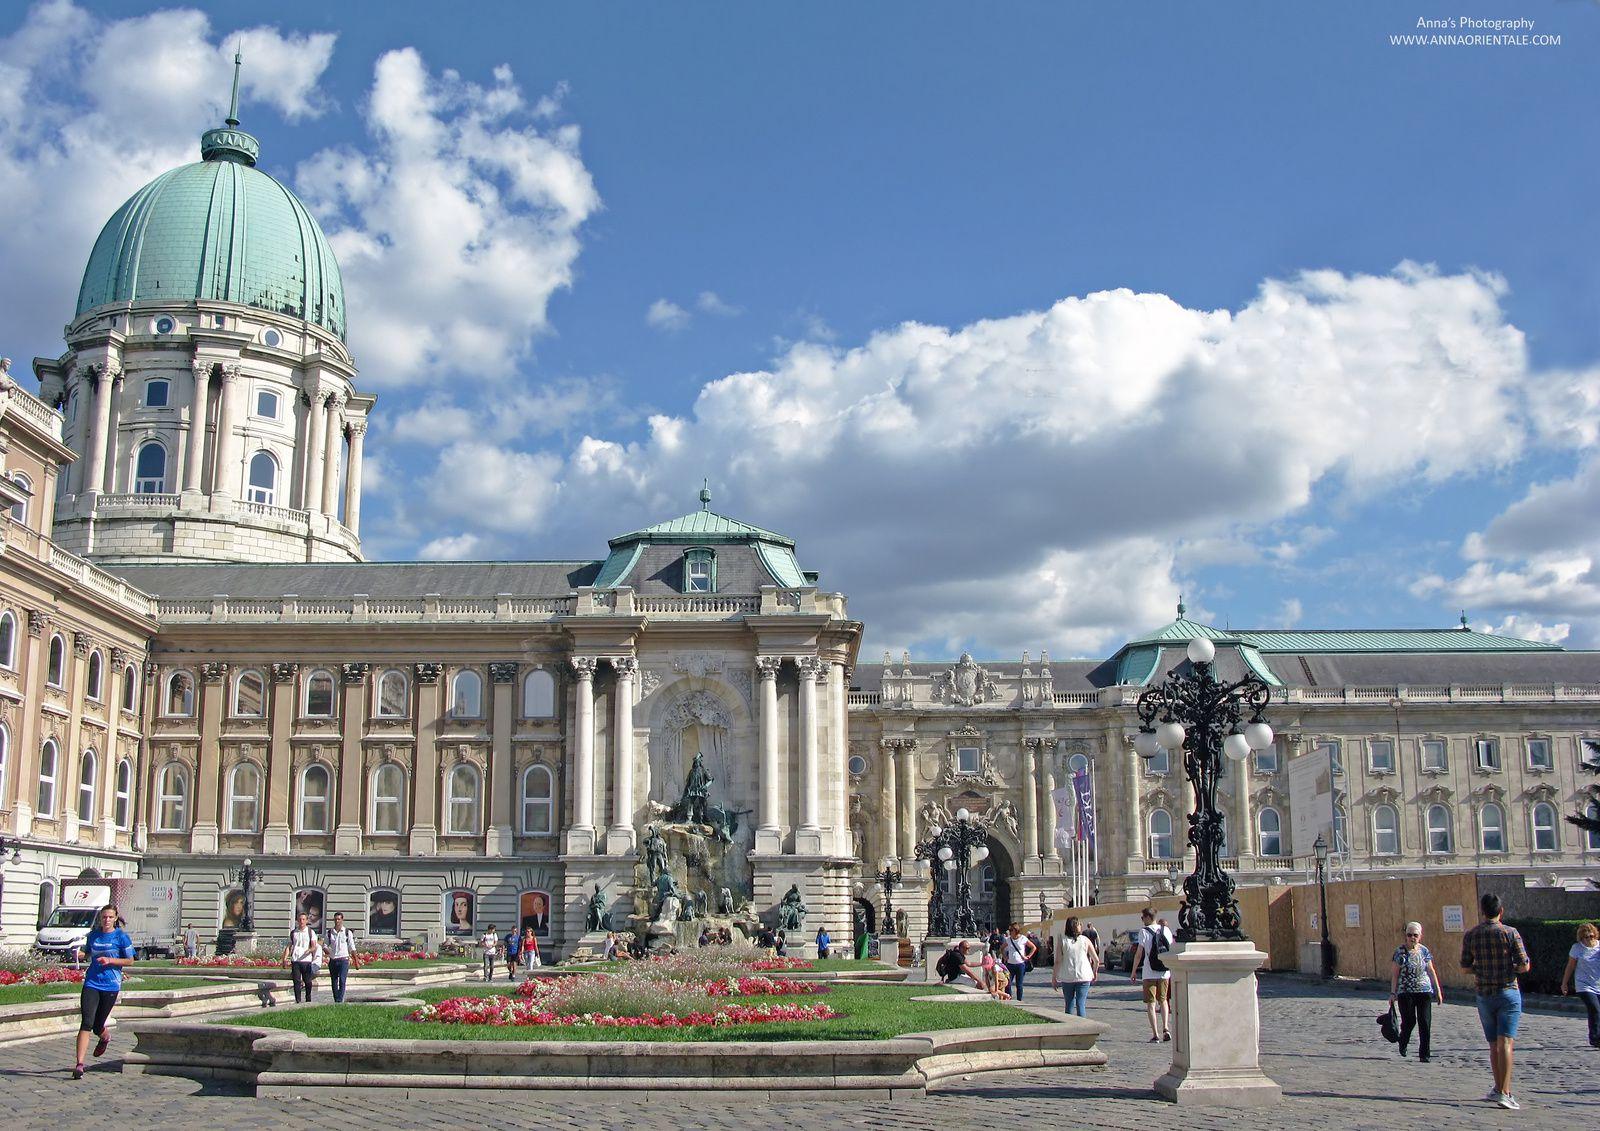 Voyage/Séjour de danse orientale avec Änna à Budapest